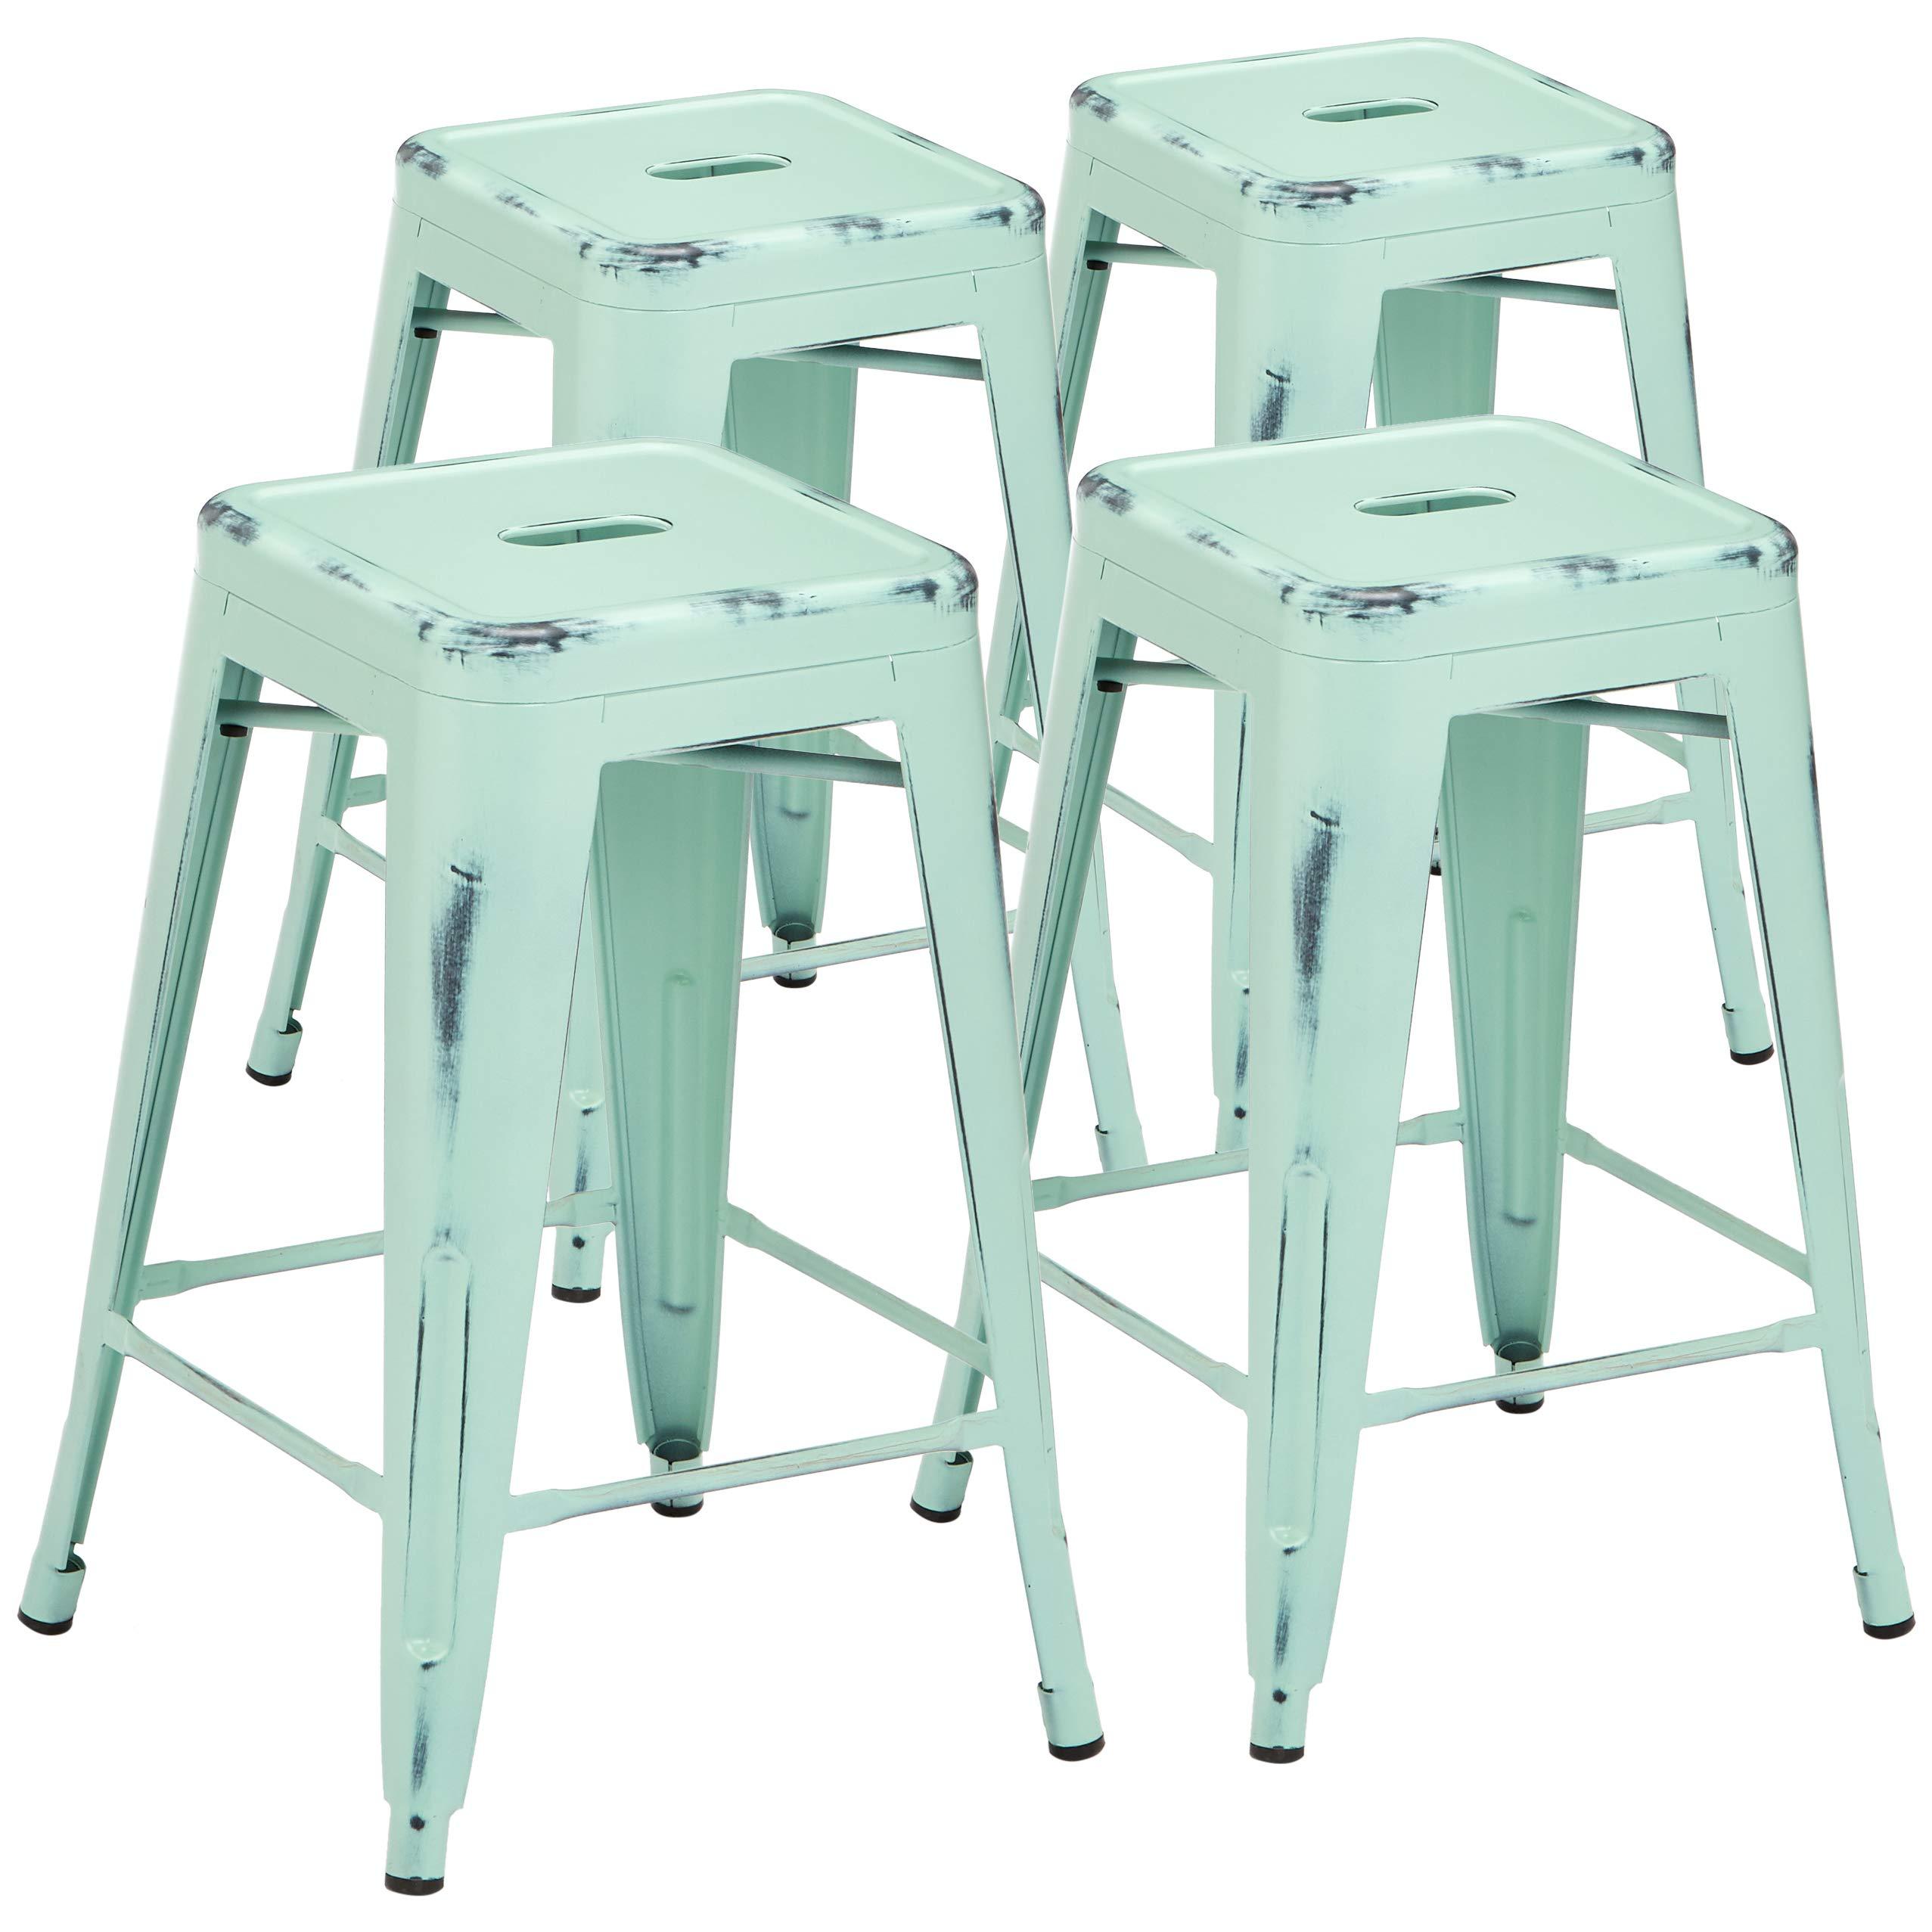 Sensational Sprogs Tolix Style Square Metal Stool 12 H Orange Spg Lamtechconsult Wood Chair Design Ideas Lamtechconsultcom